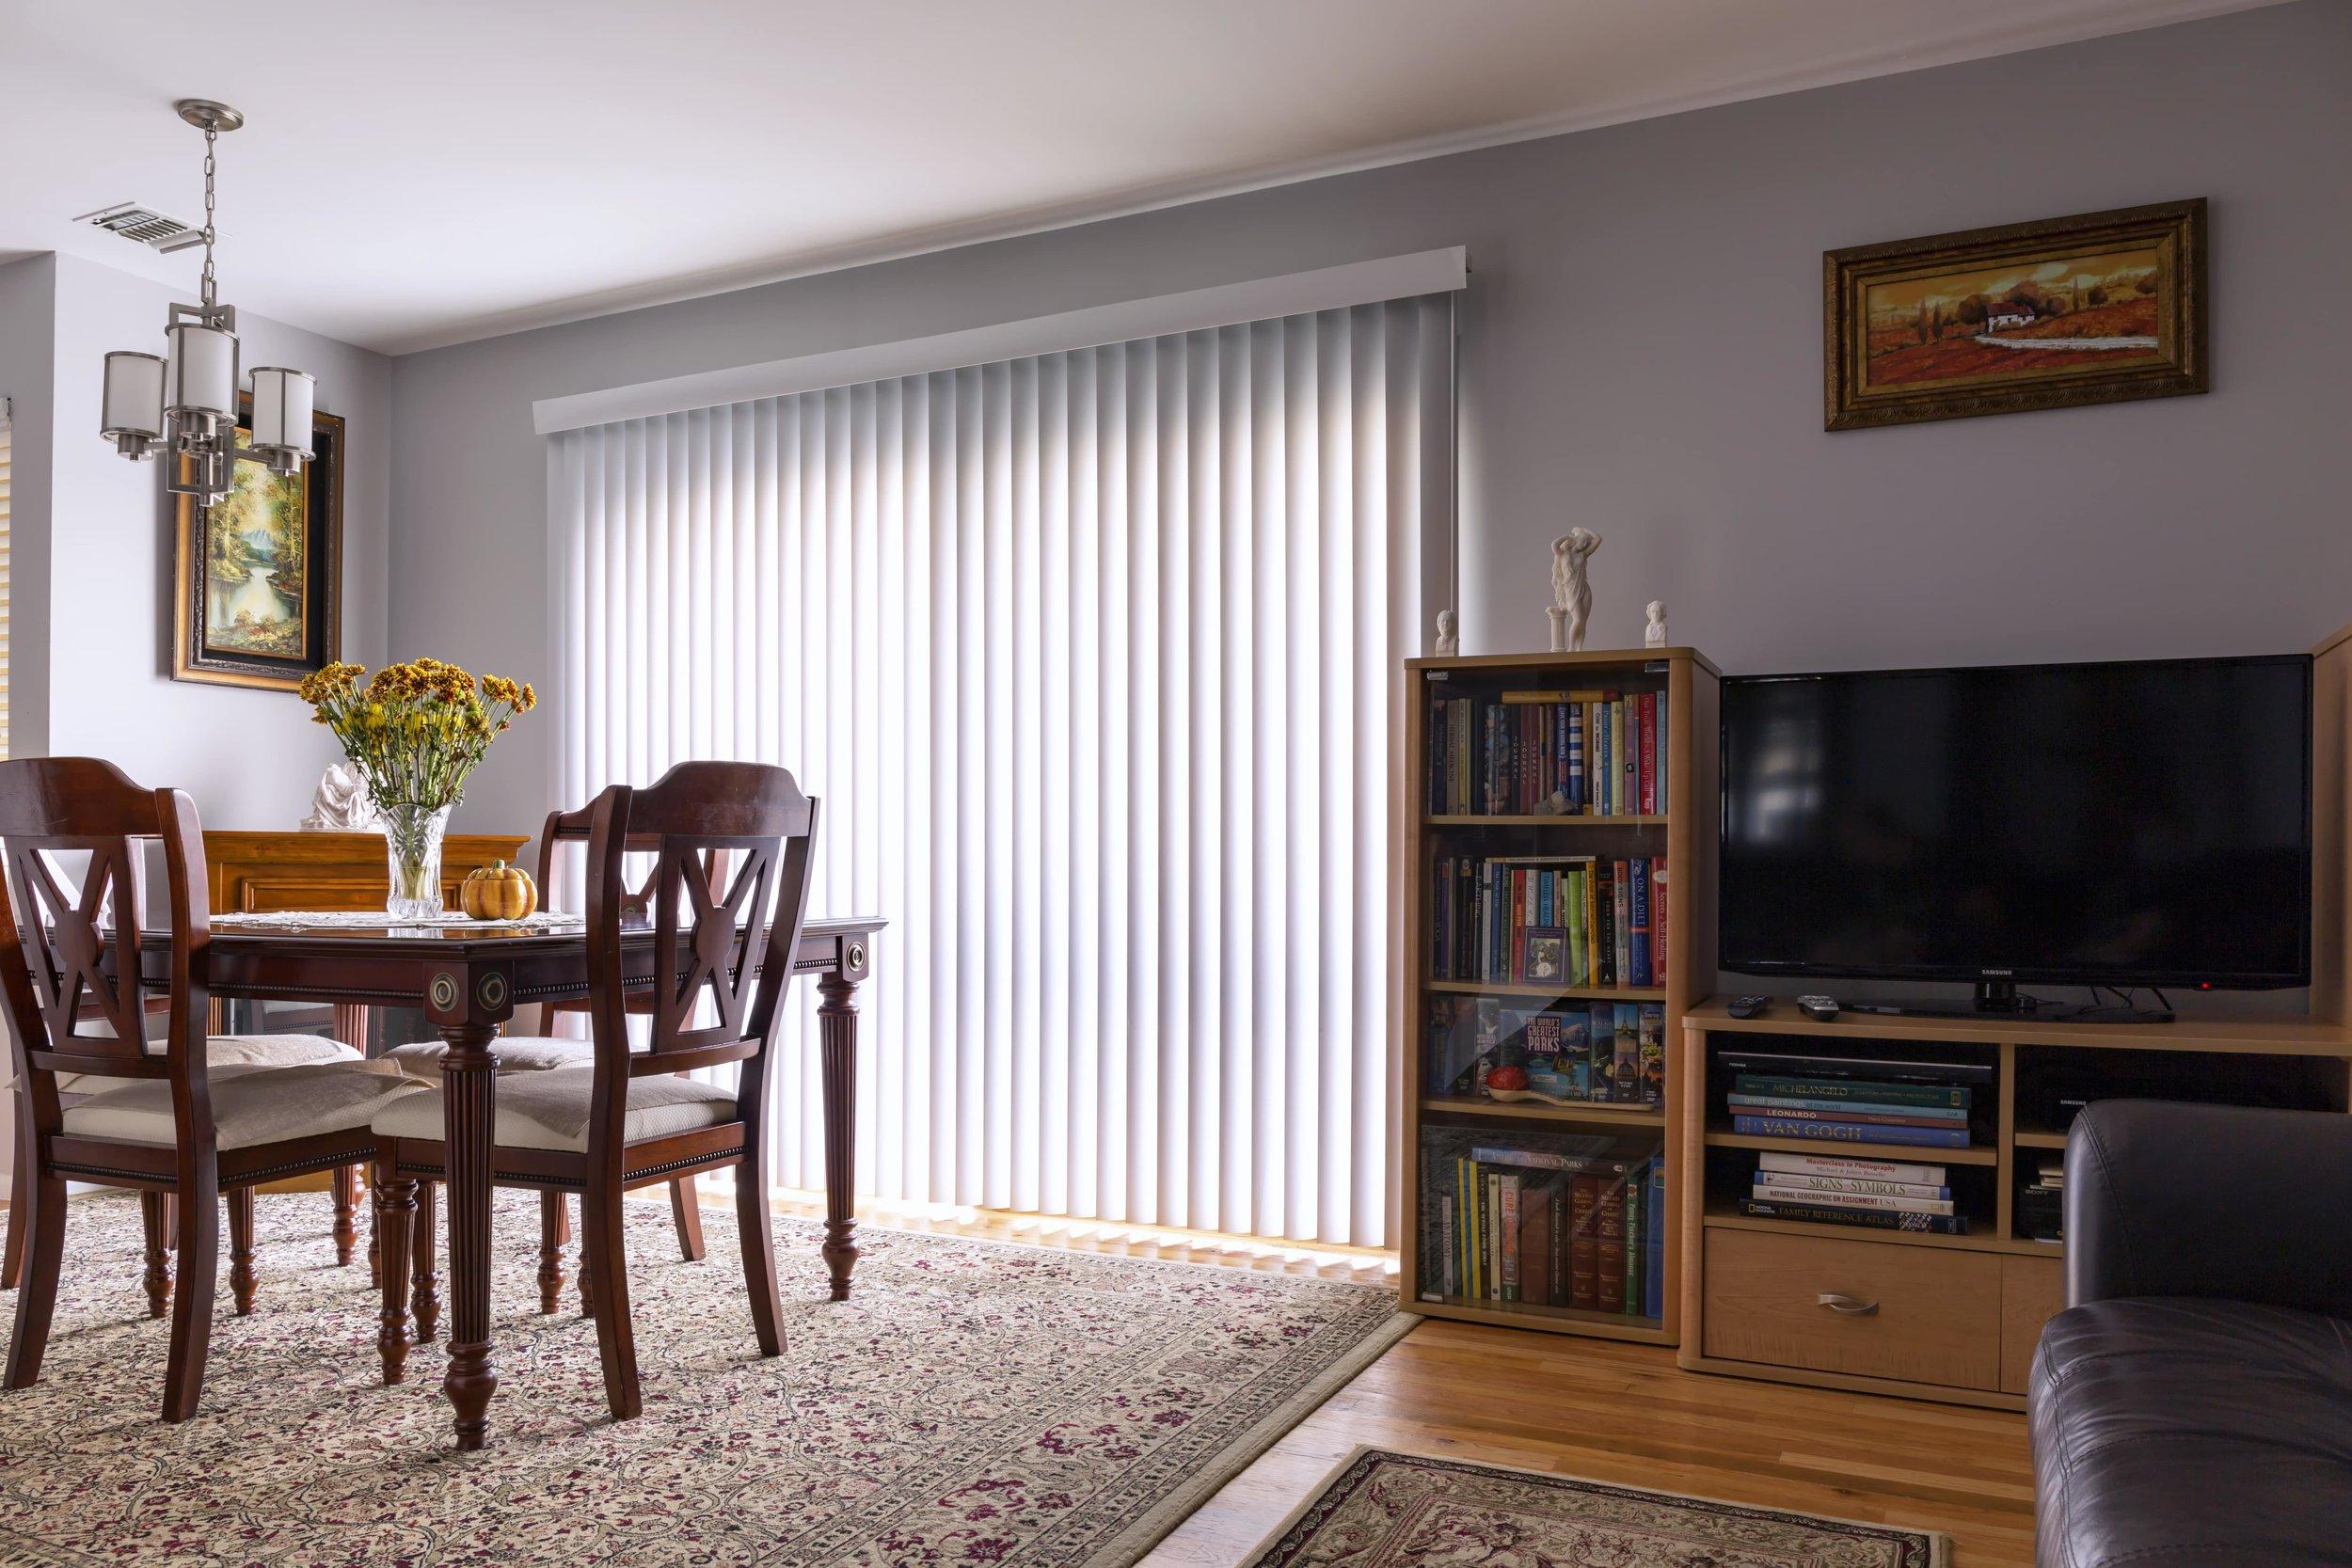 Canva - Home Interior, Vertical Blinds, Sliding Door, Blinds-min.jpg